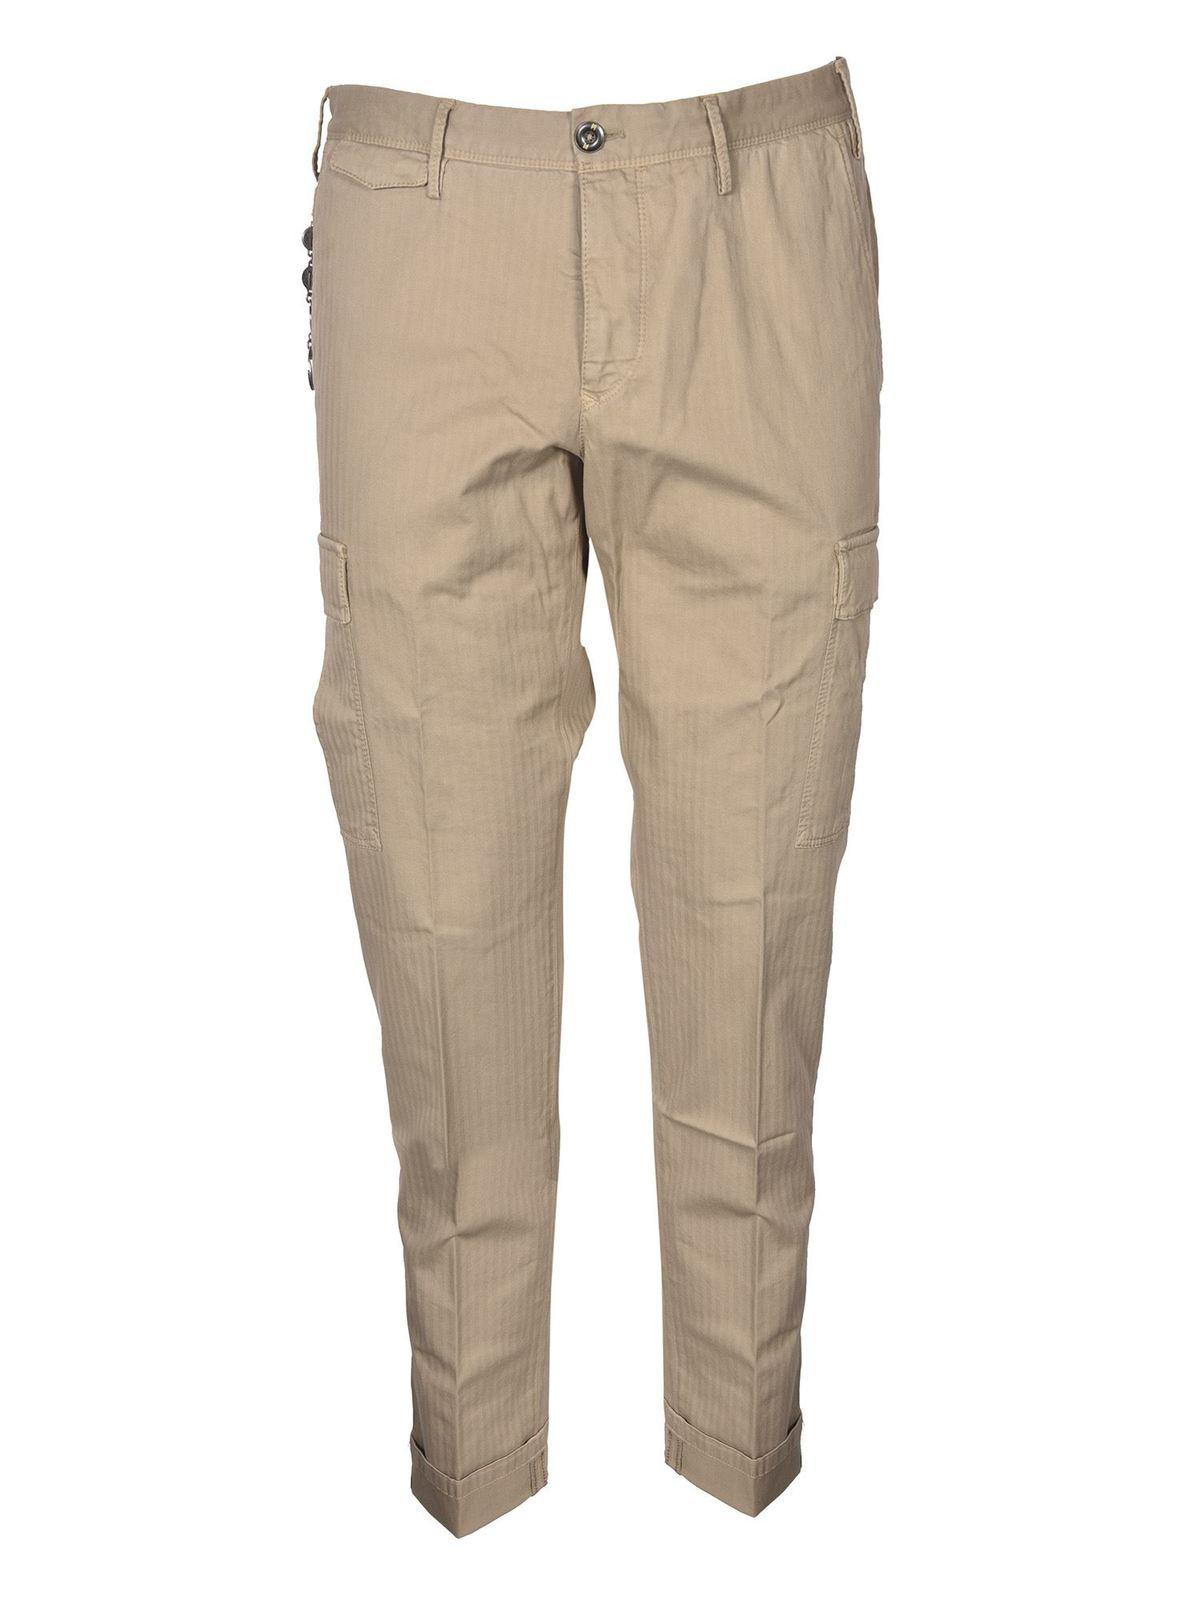 Pt Torino Cargo Trousers In Beige